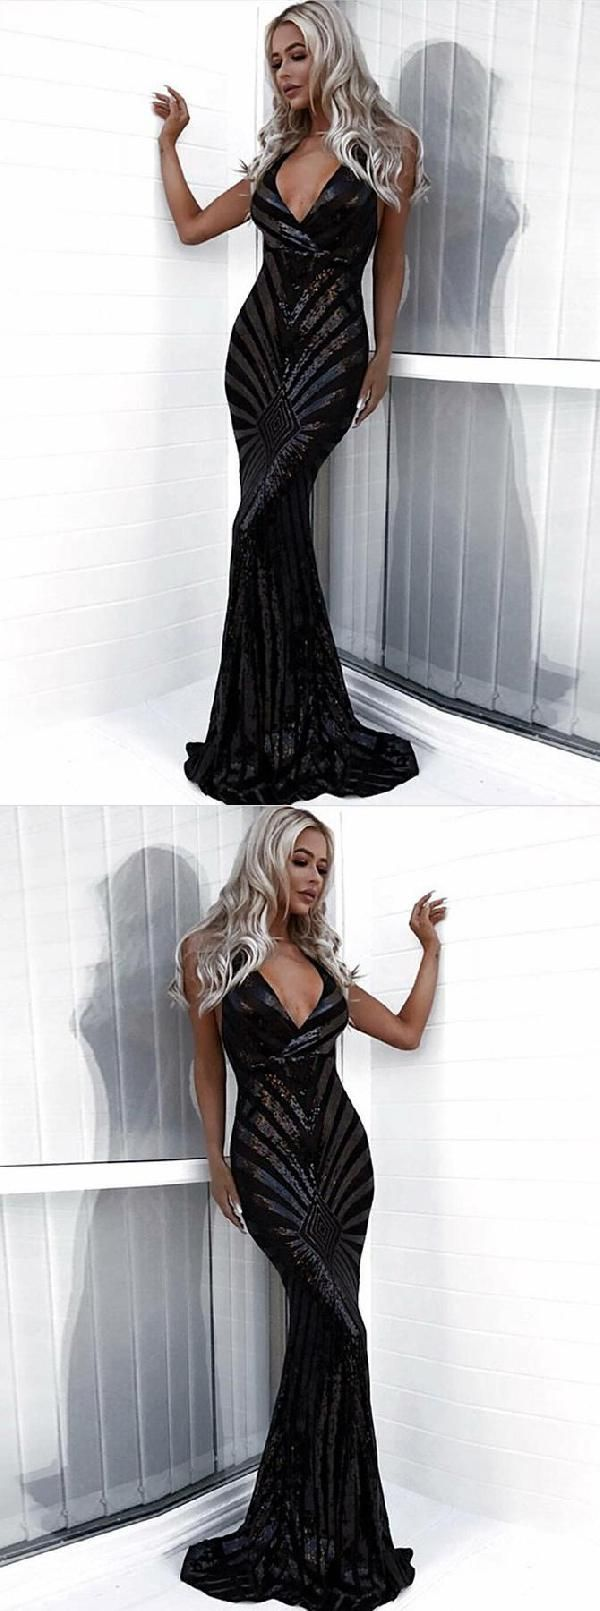 Enticing prom dresses black mermaid prom dresses prom dresses